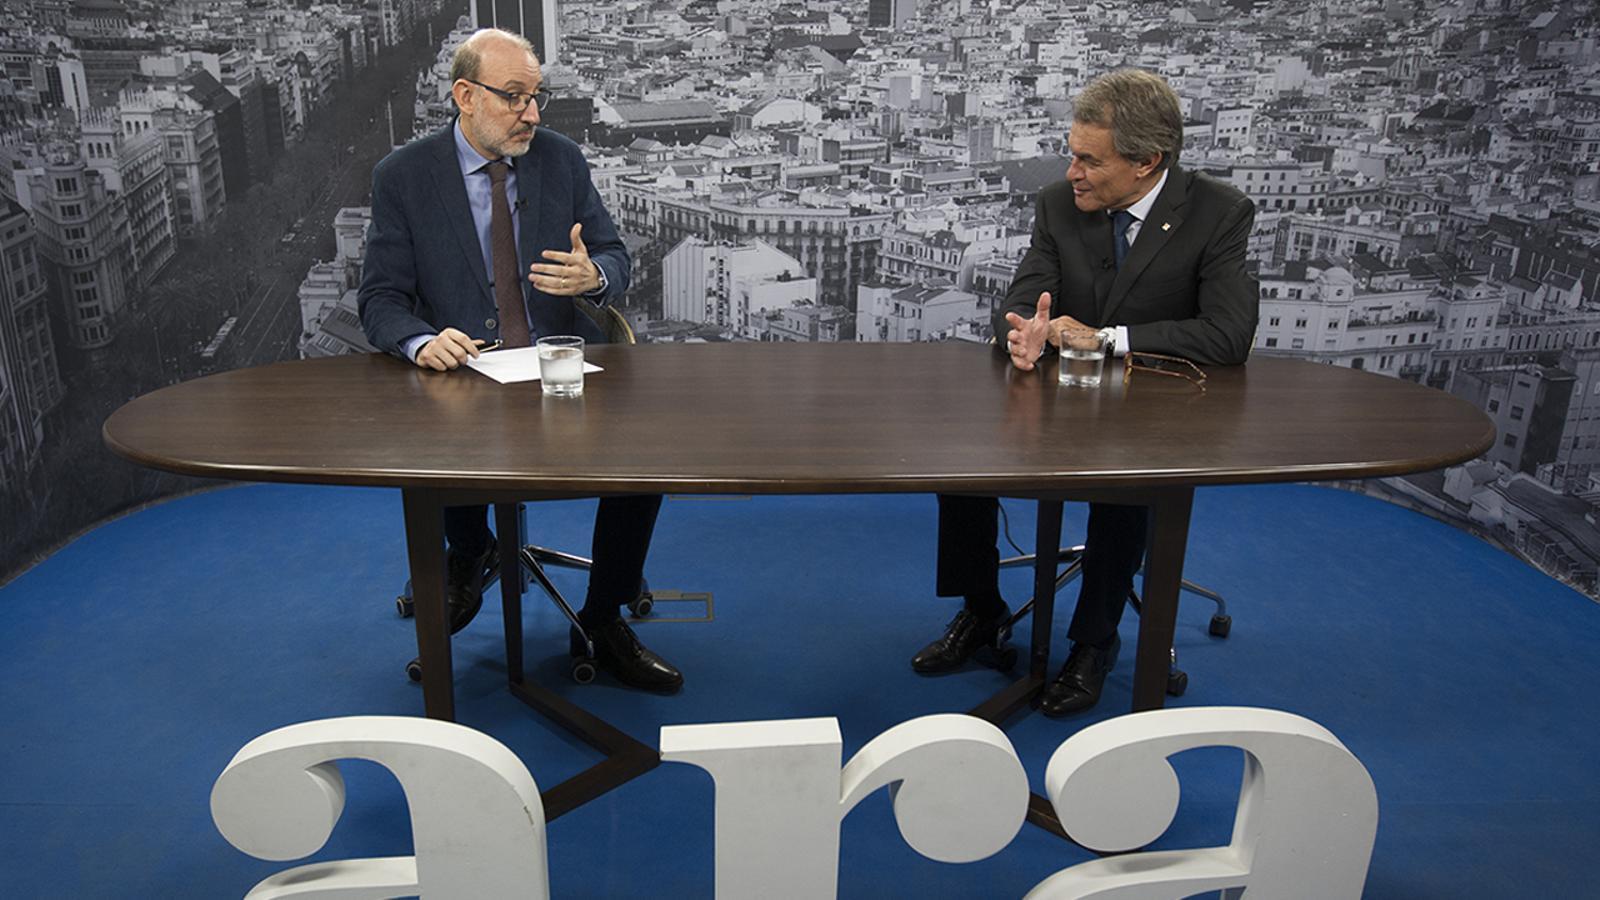 Entrevista d'Antoni Bassas a Artur Mas